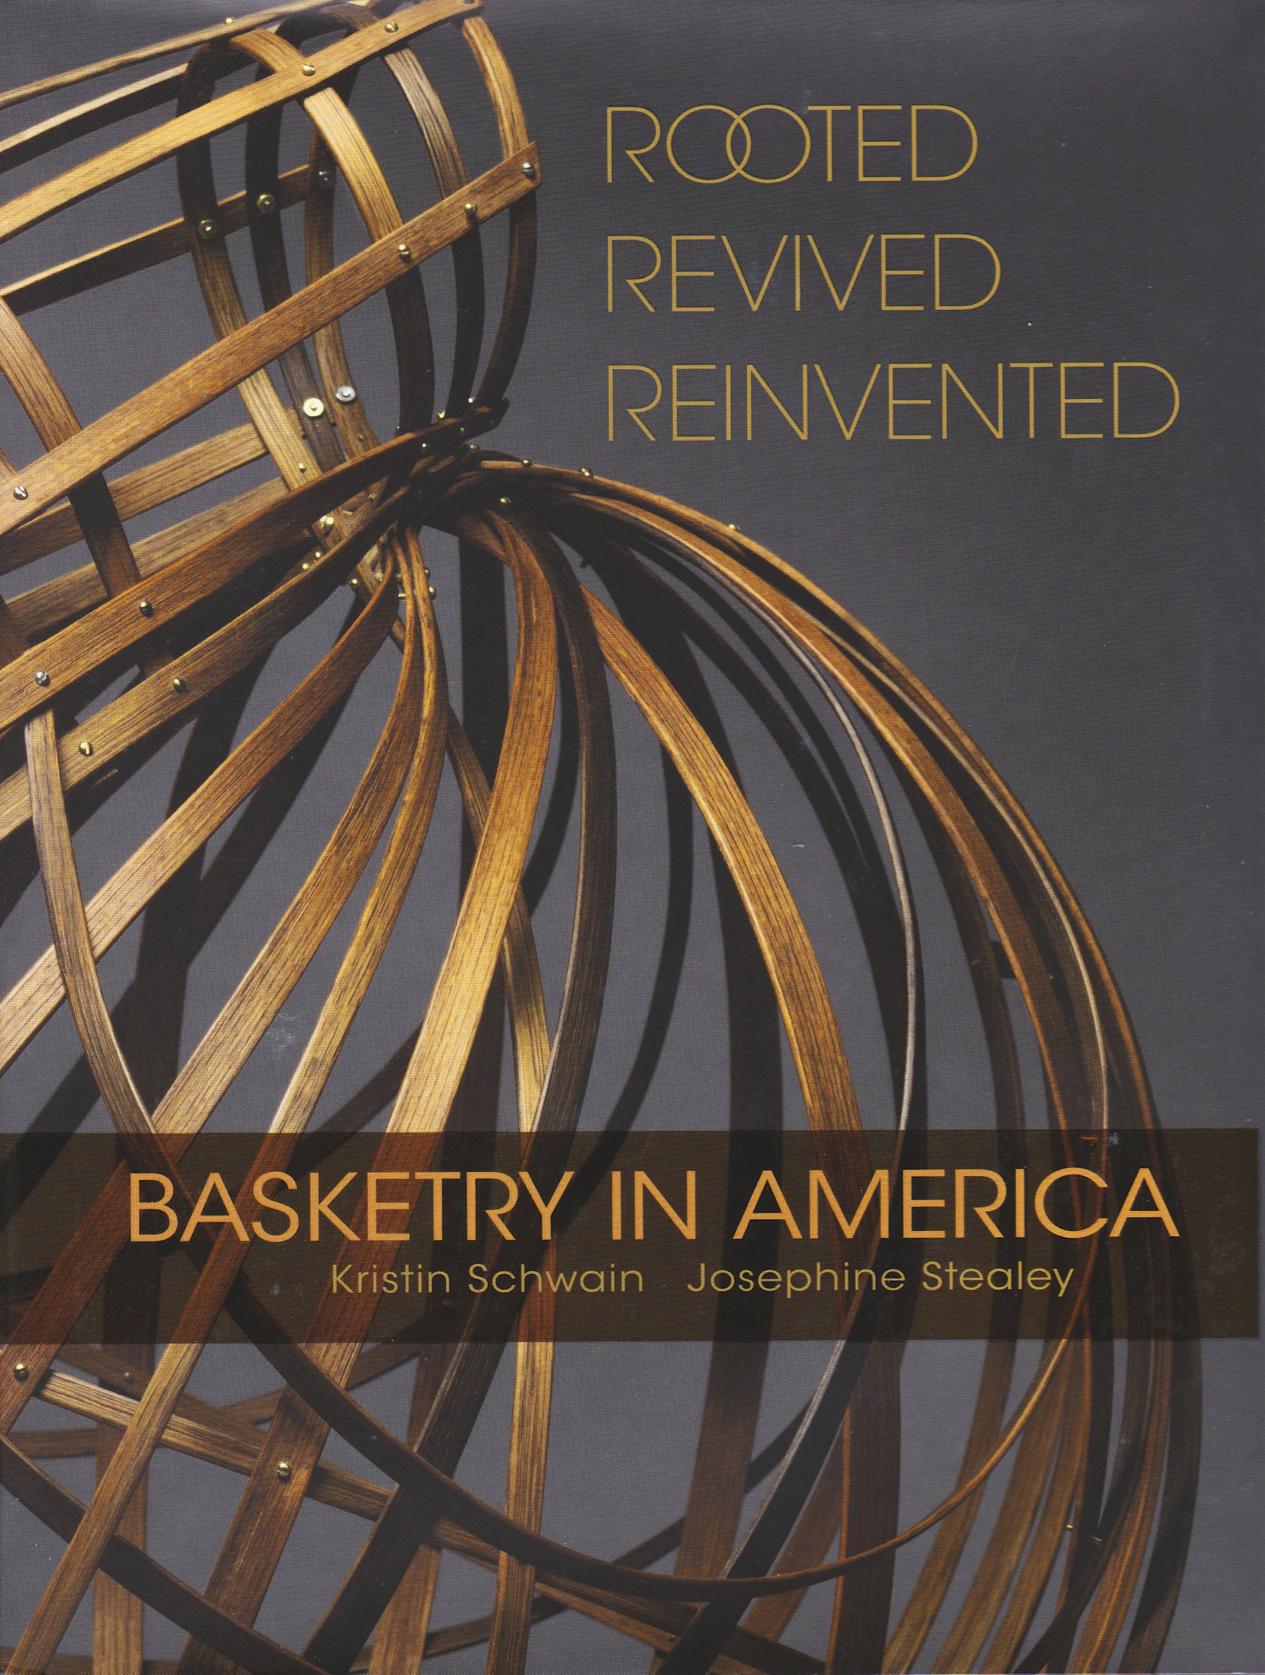 BASKETRY IN AMERICA